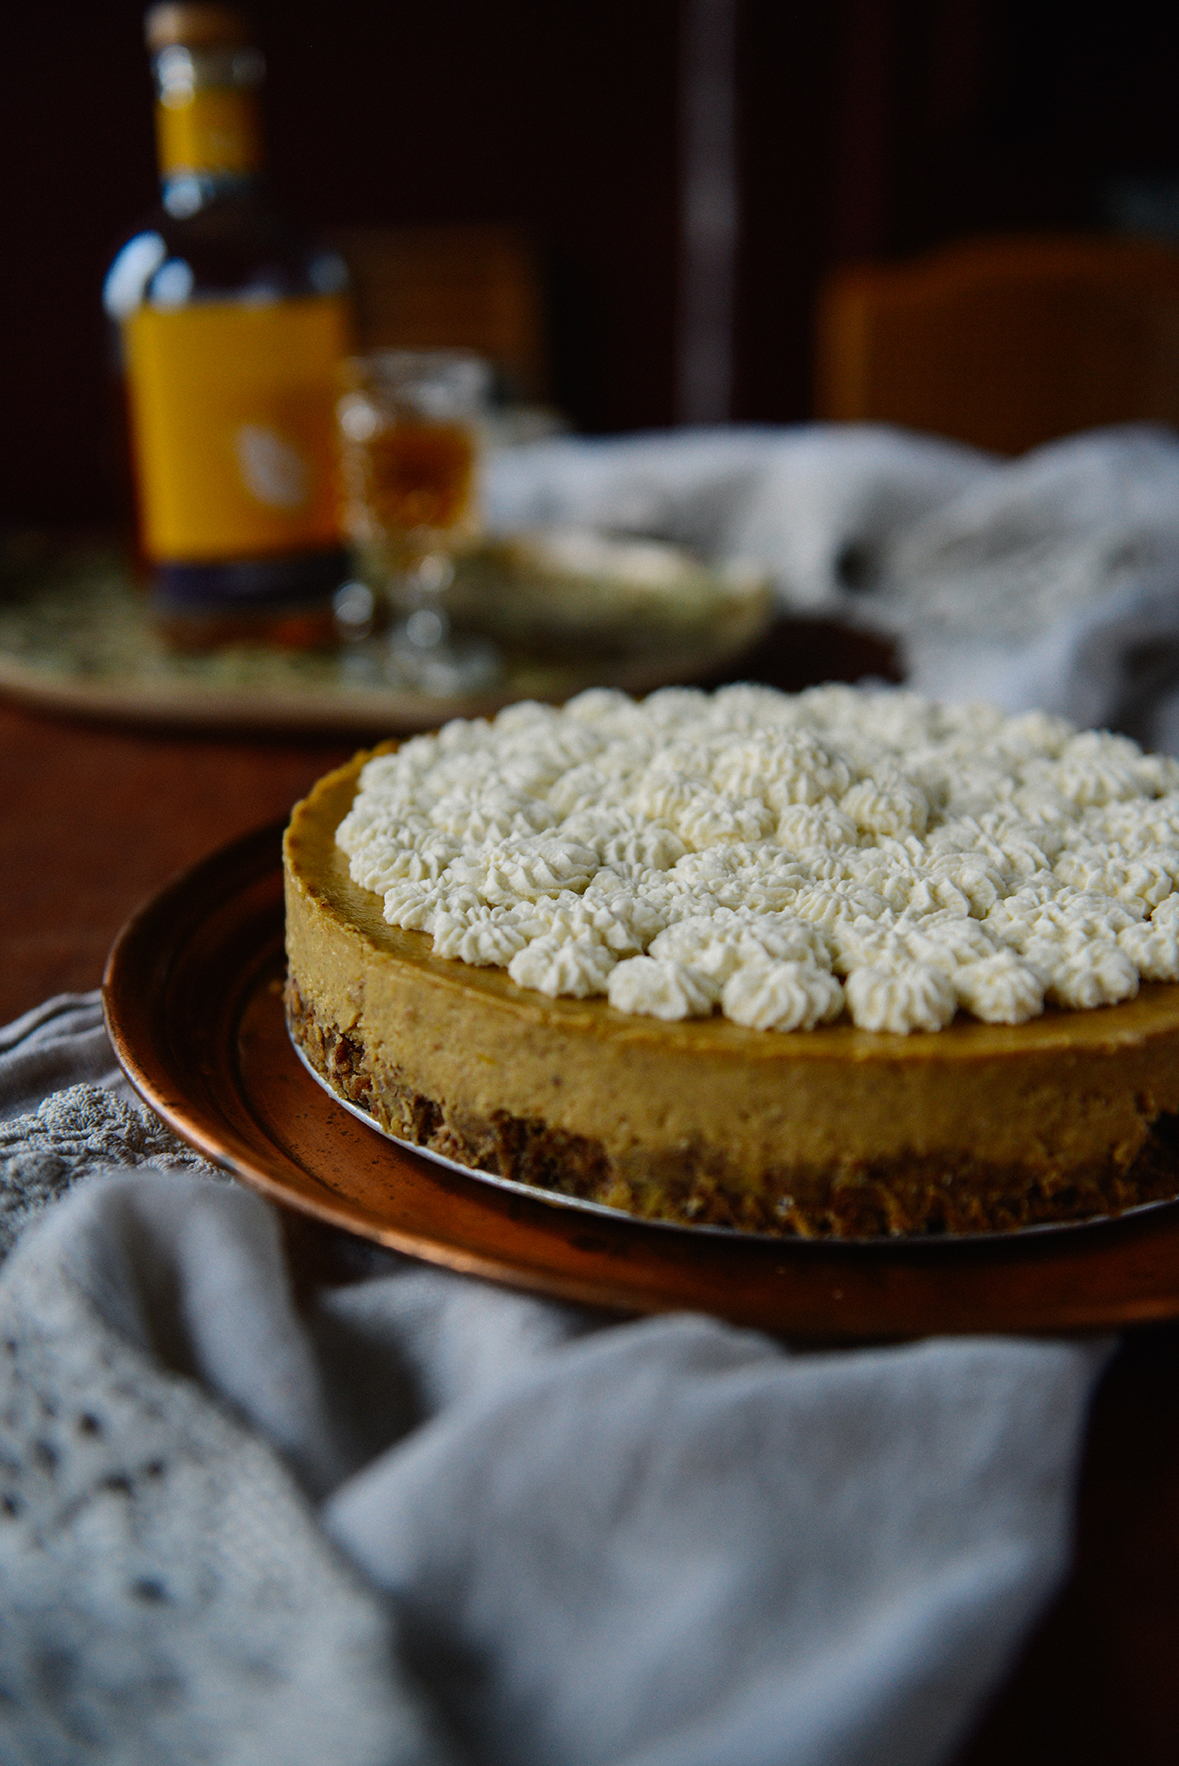 Pumpkin Cheesecake w/ Ginger & Spice Oat Crust (Gluten Free)